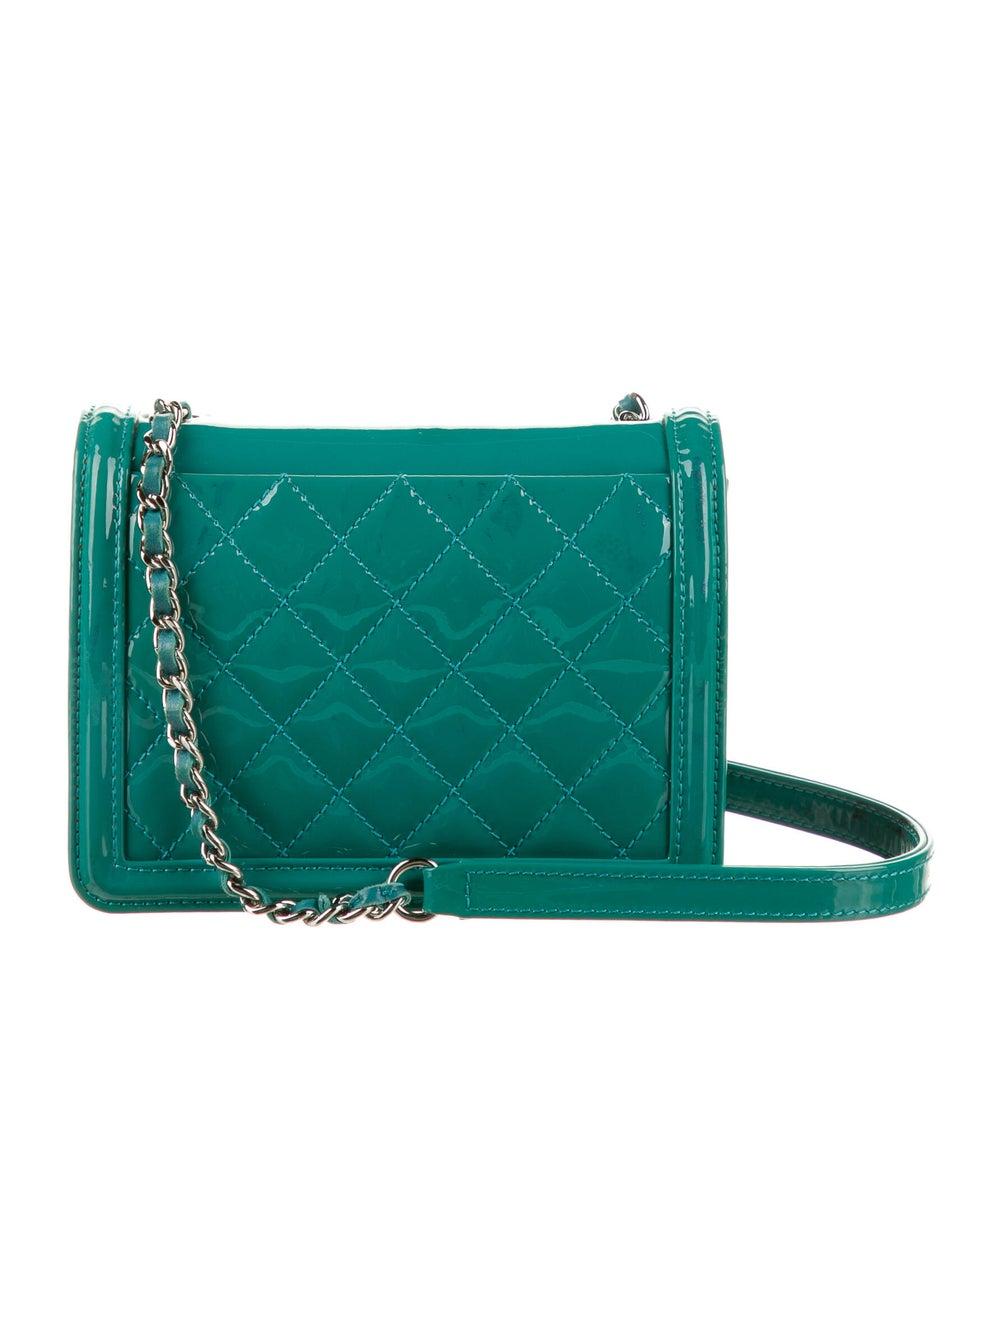 Chanel Boy Brick Flap Bag Blue - image 4